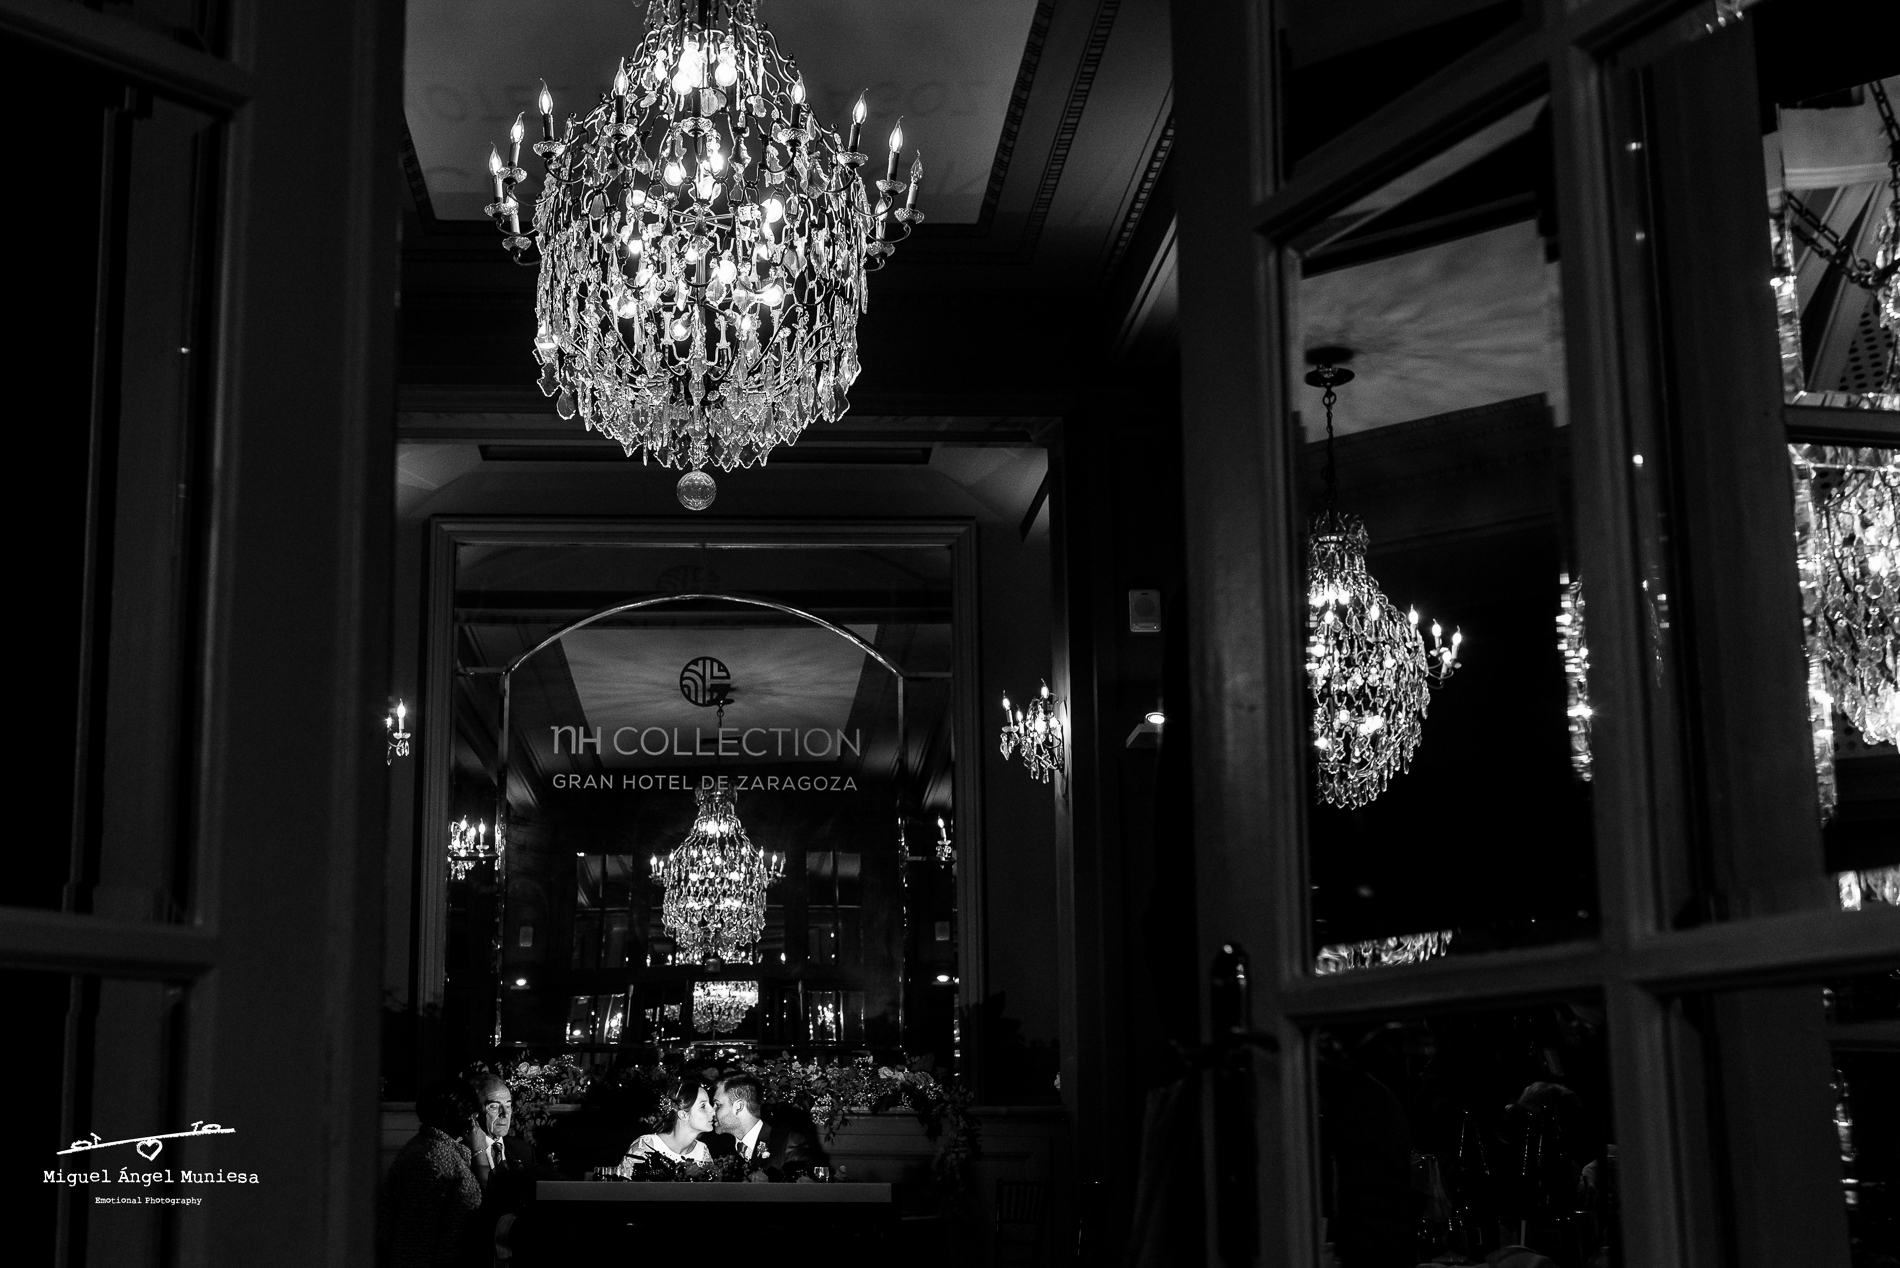 miguel angel muniesa, fotografo boda Teruel, fotografo boda navarra, fotografo boda zaragoza, fotografo boda soria, miguel angel muniesa emotional photography_23